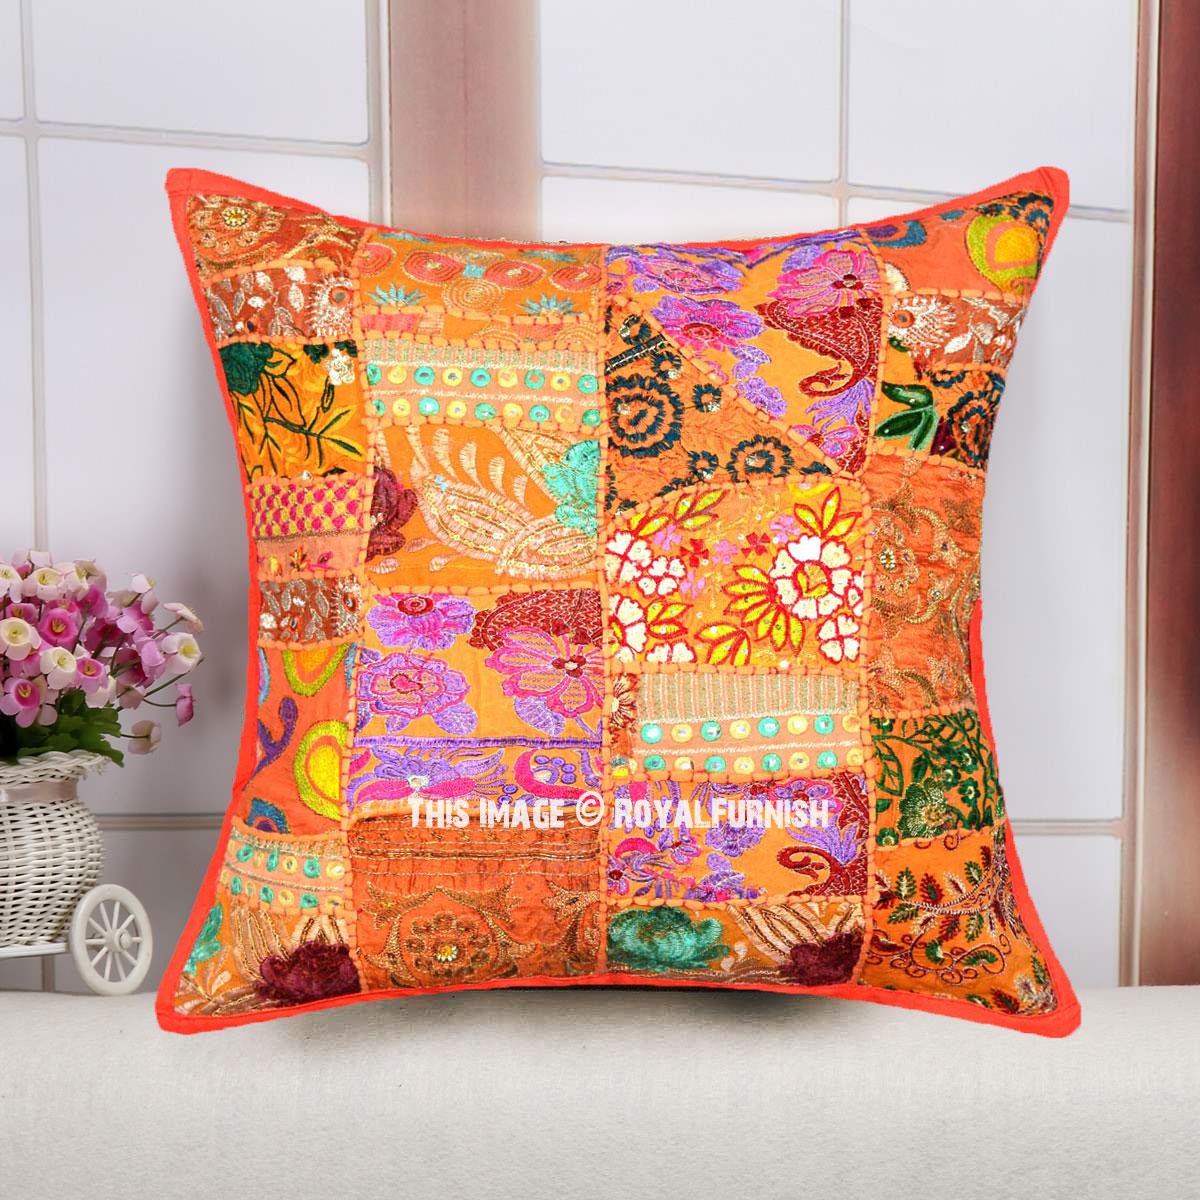 Orange Multi Old Fabric Patchwork Bohemian Accent Square